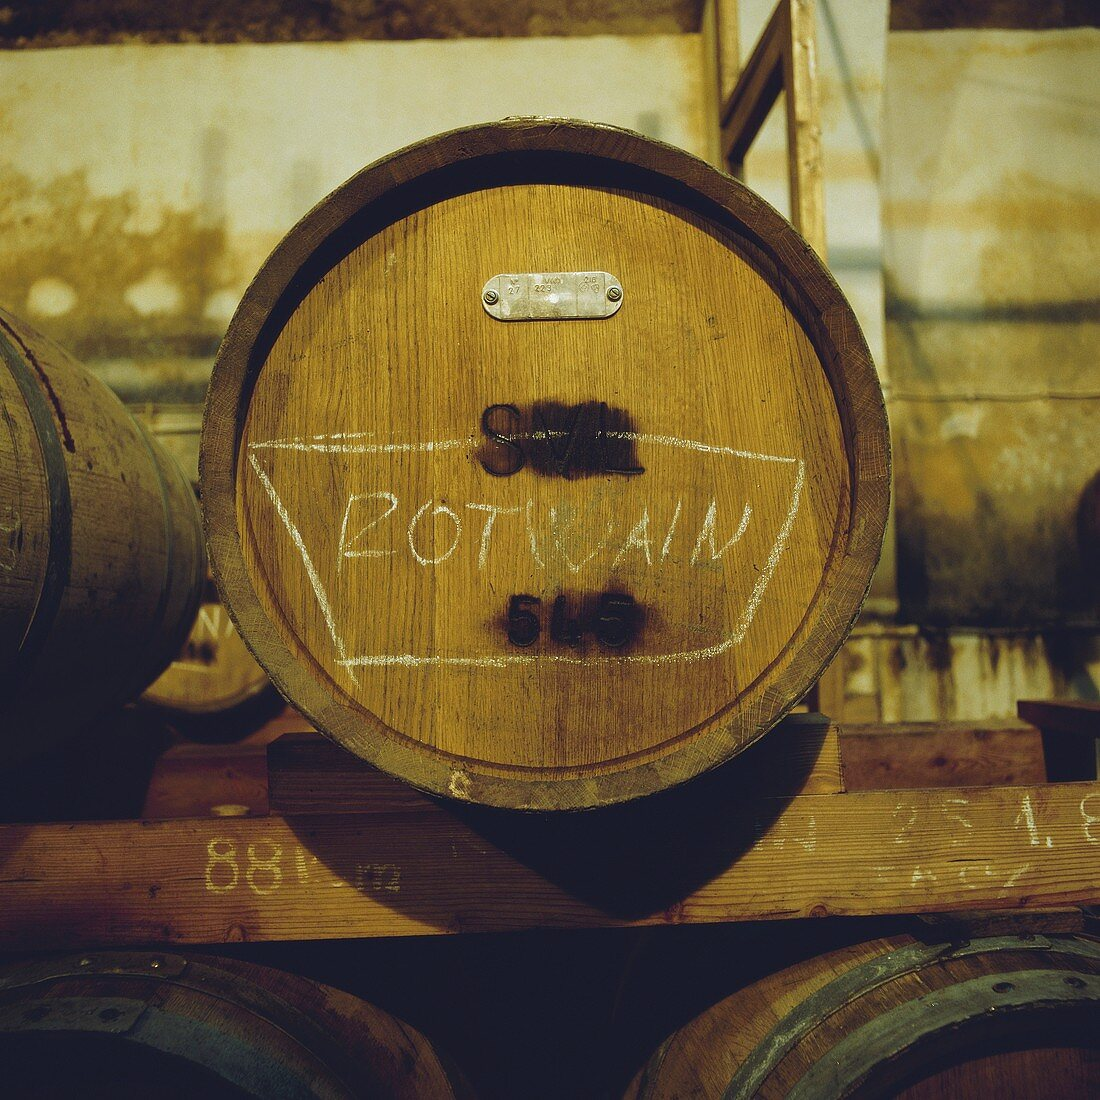 Red wine barrels in a wine cellar, Slovin, Slovenia